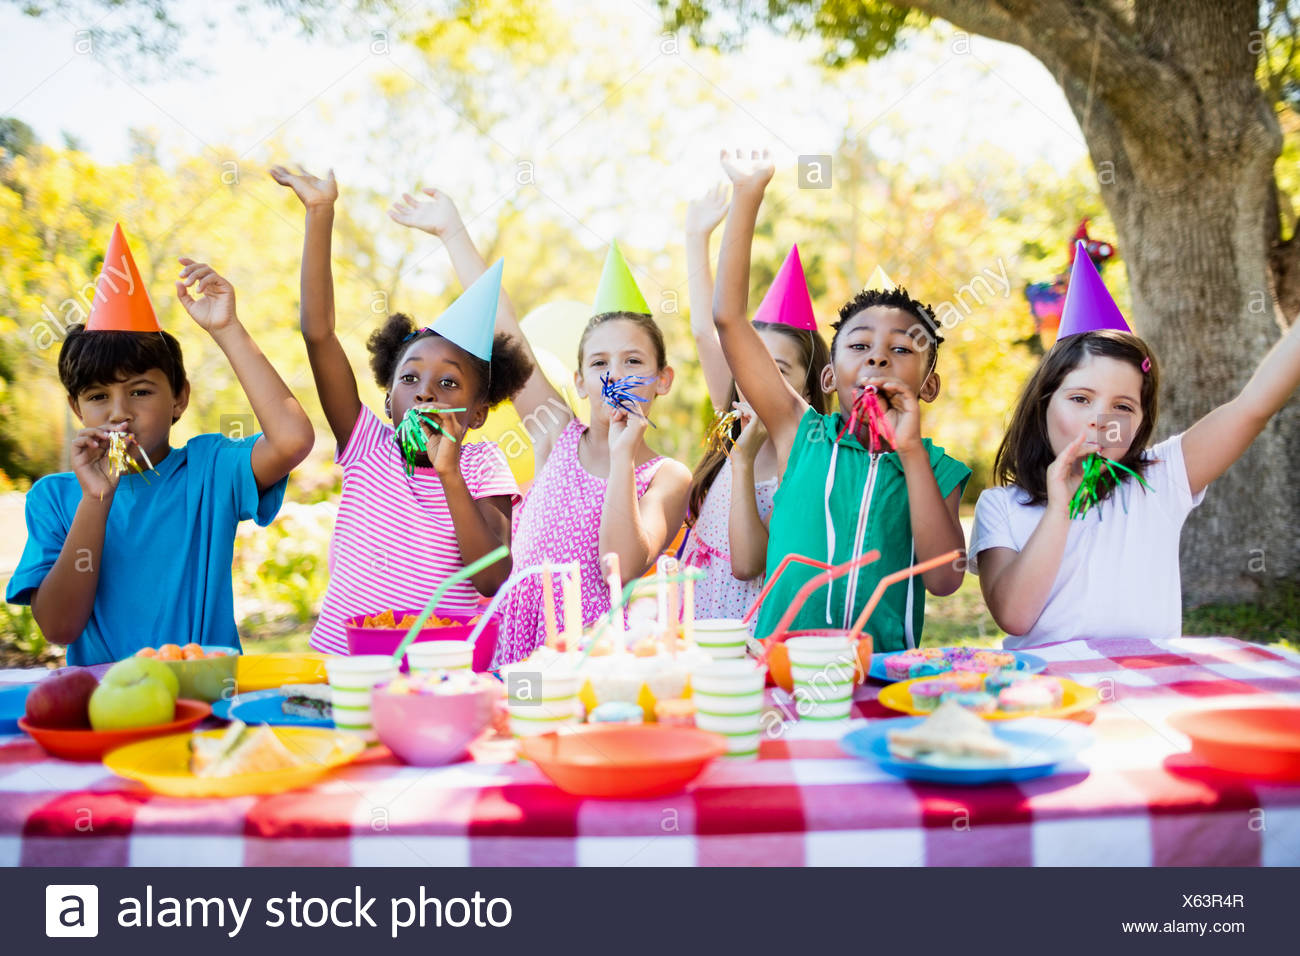 Süße Kinder Spaß während einer Geburtstagsfeier Stockbild